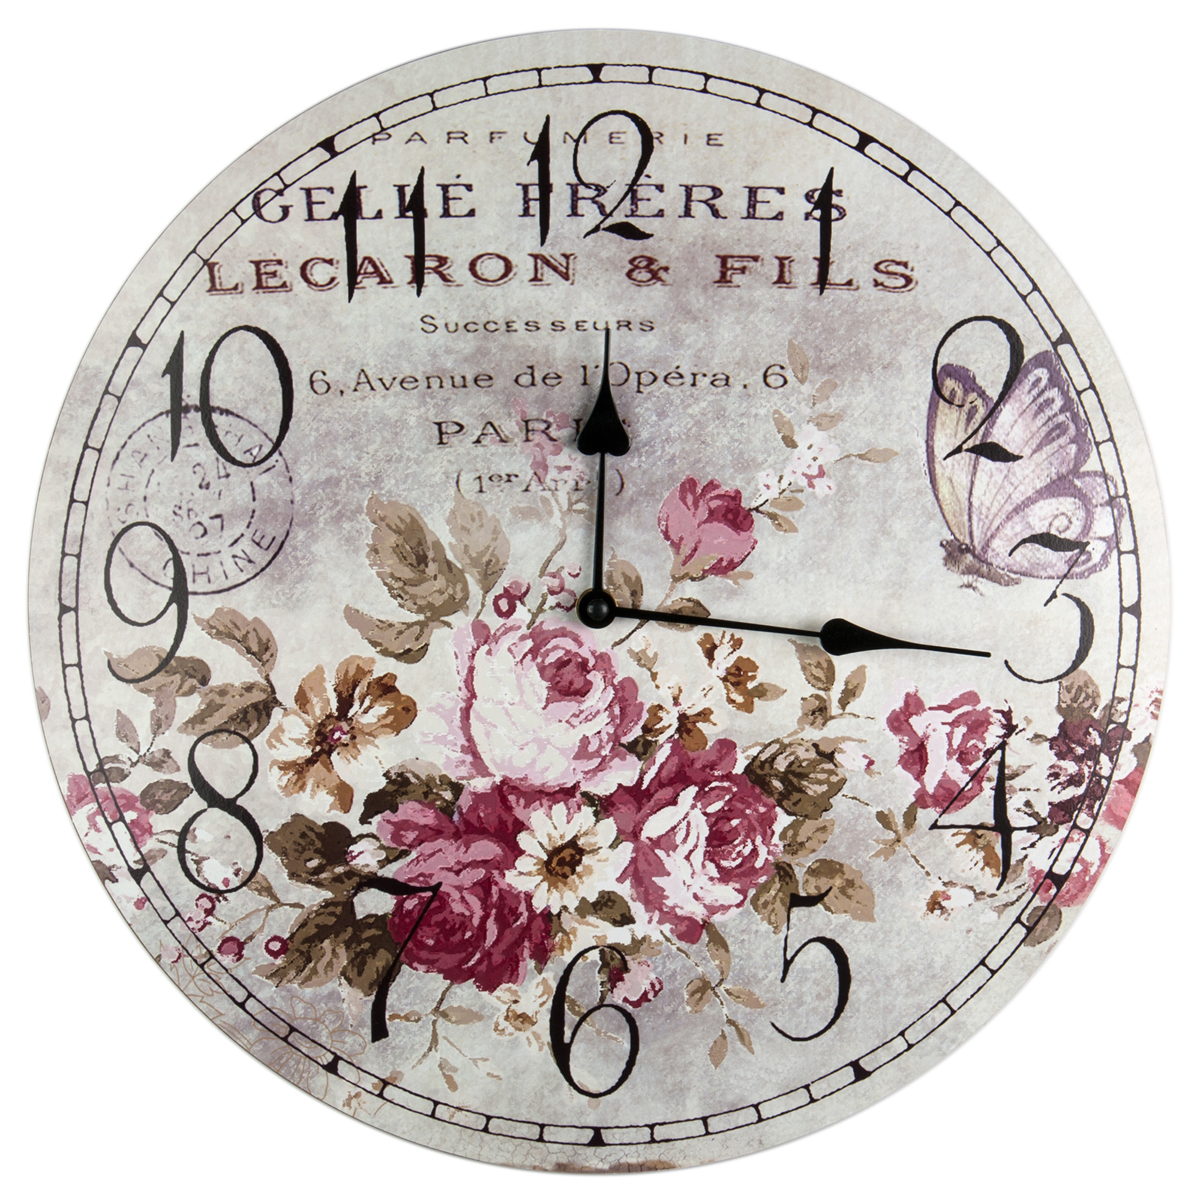 Часы настенные Miralight, 39 x 39 см. MC-673 meinl mc pts 12 x 12